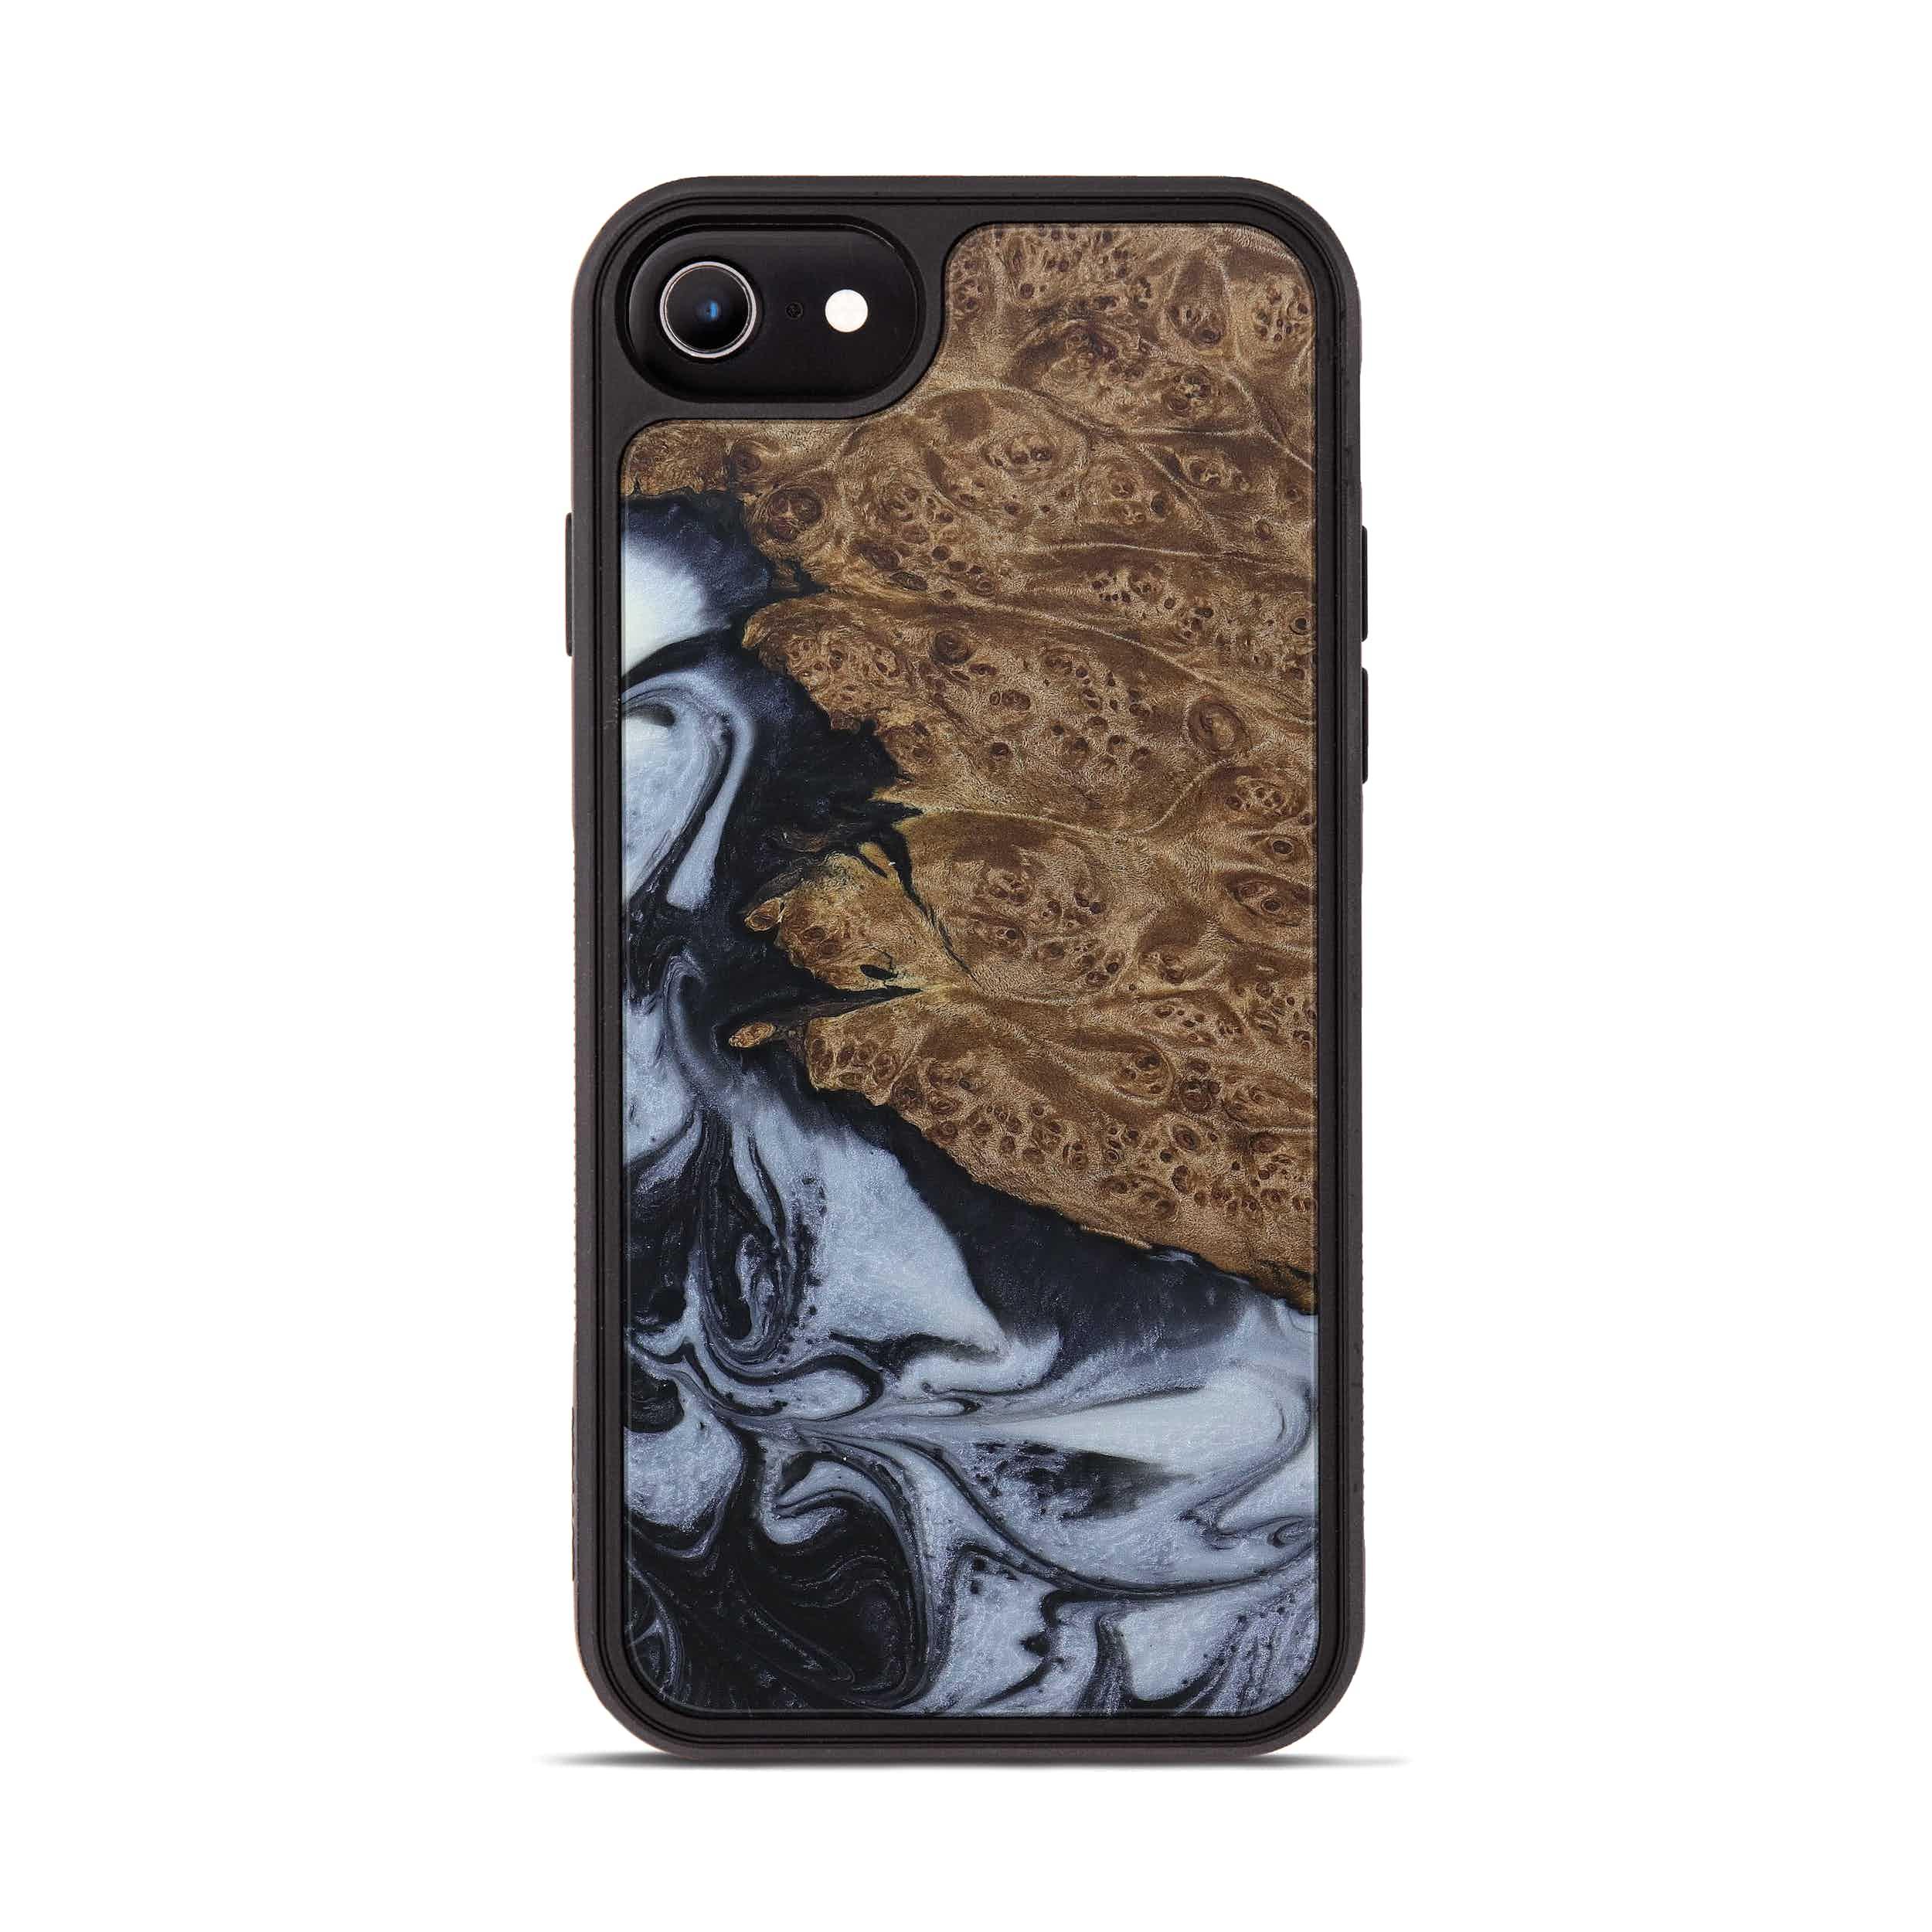 iPhone 6s Wood+Resin Phone Case - Sella (Black & White, 397906)